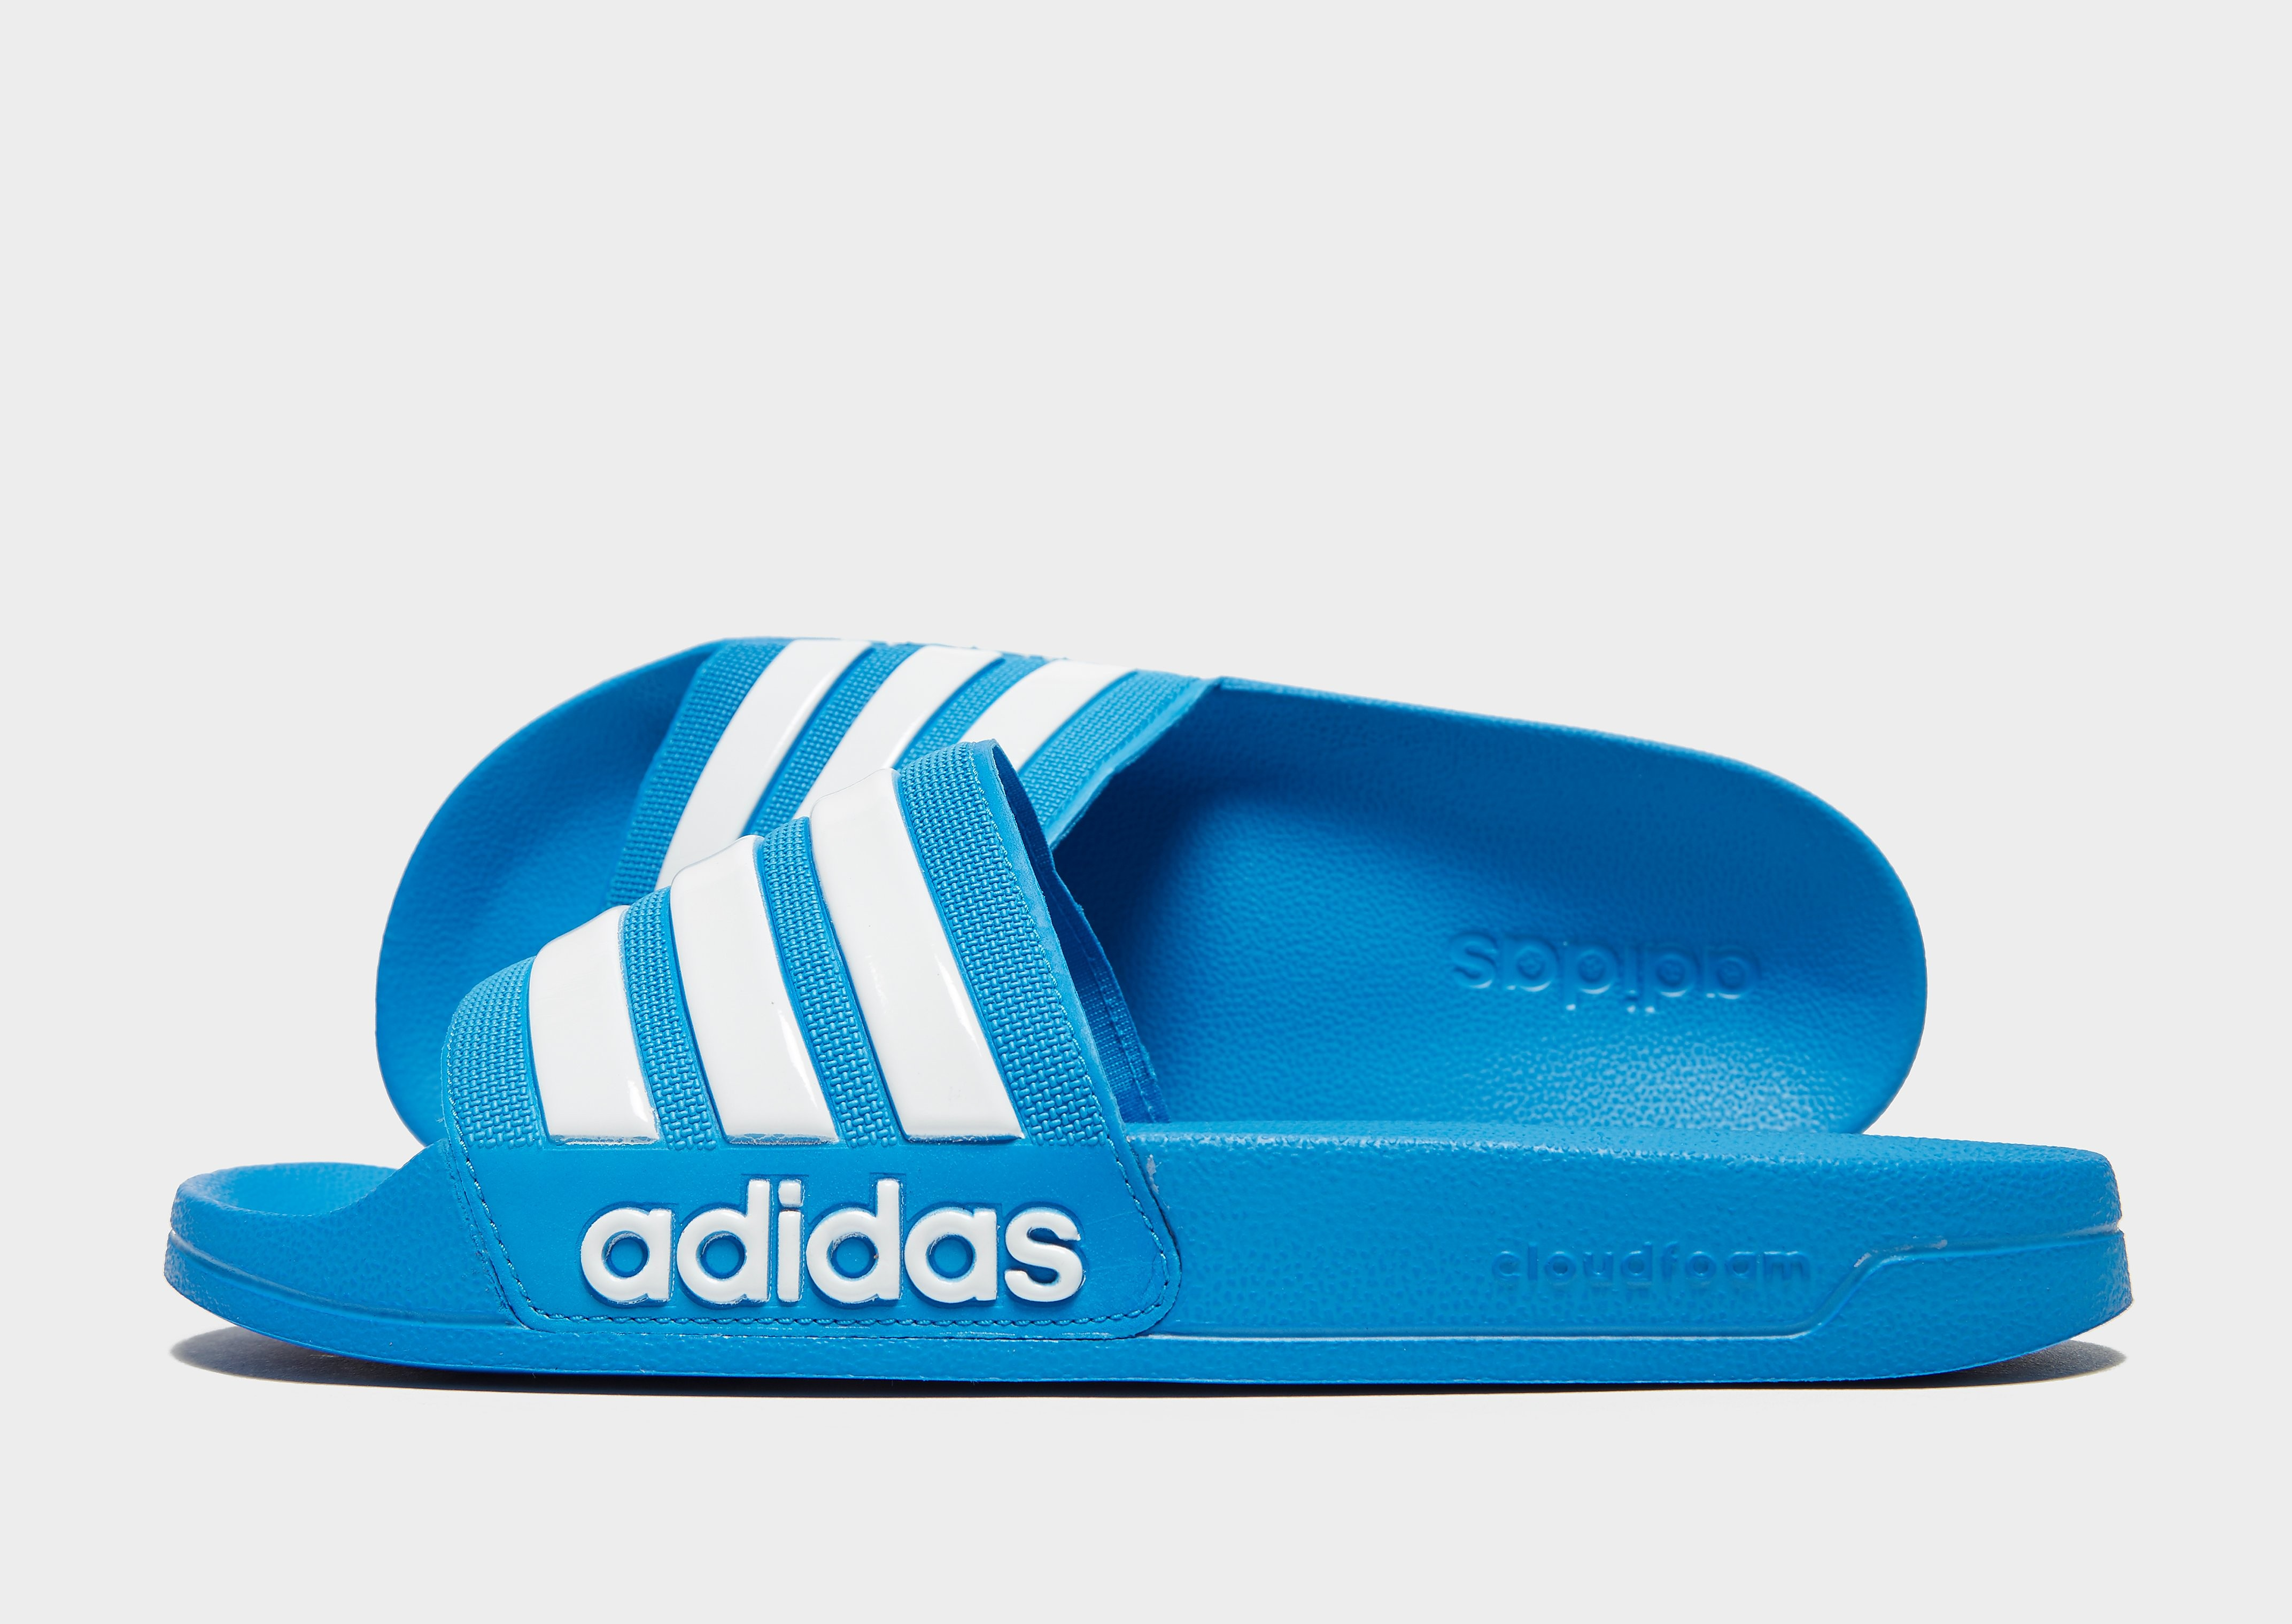 adidas Originals Adilette Cloudfoam Slides - Only at JD - Blau - Mens, Blau